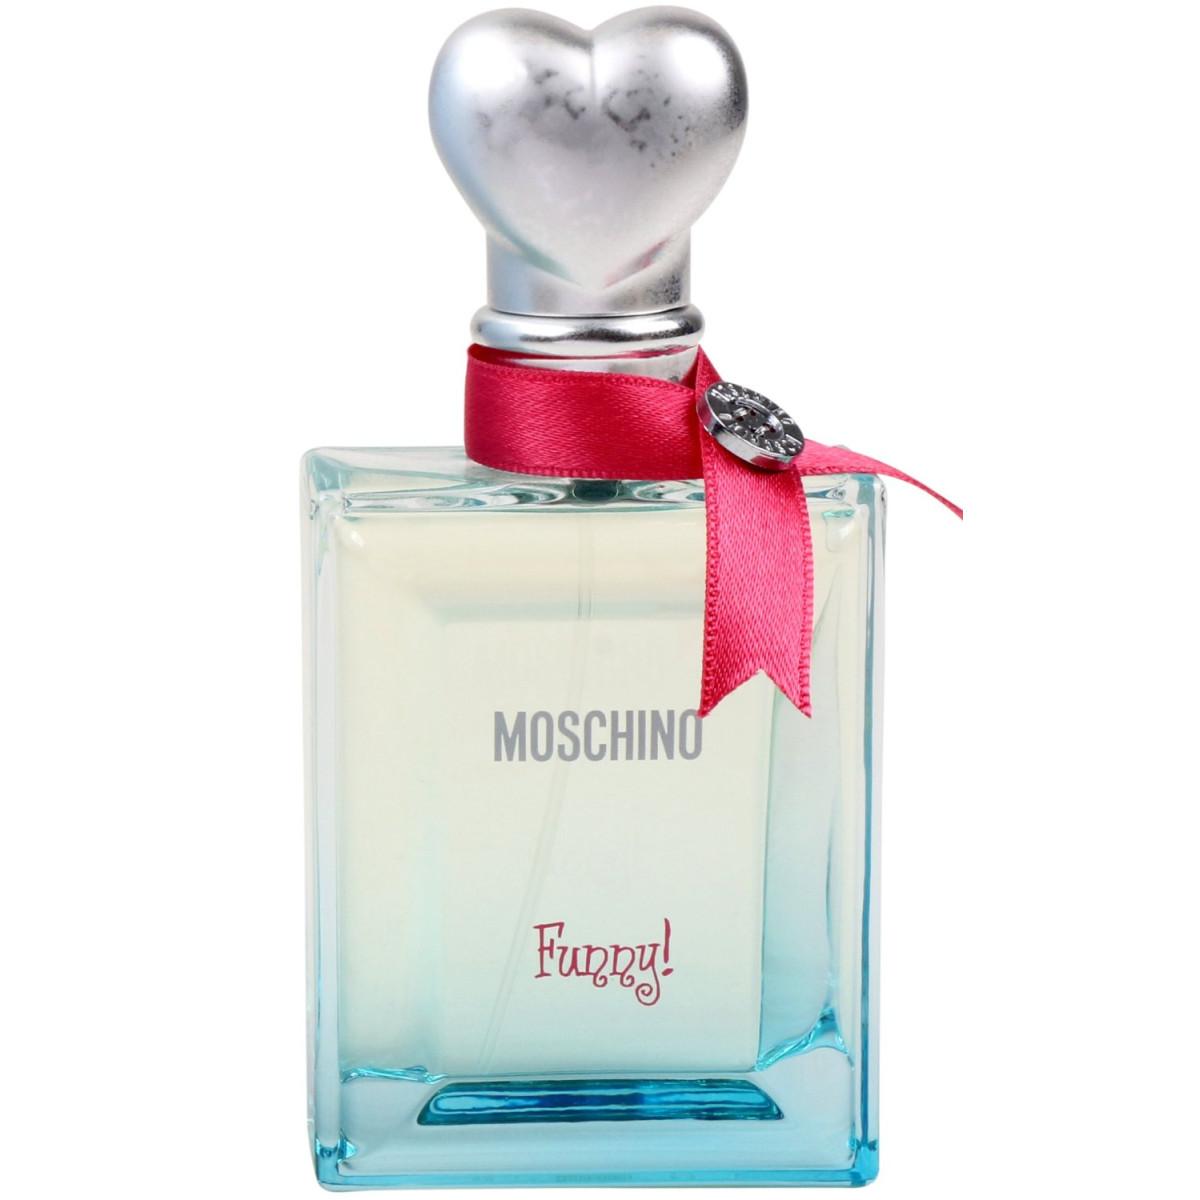 0a5b8d0fa755 Moschino Funny! By Moschino For Women, Eau De Toilette Spray, 3.4-Ounce  Bottle